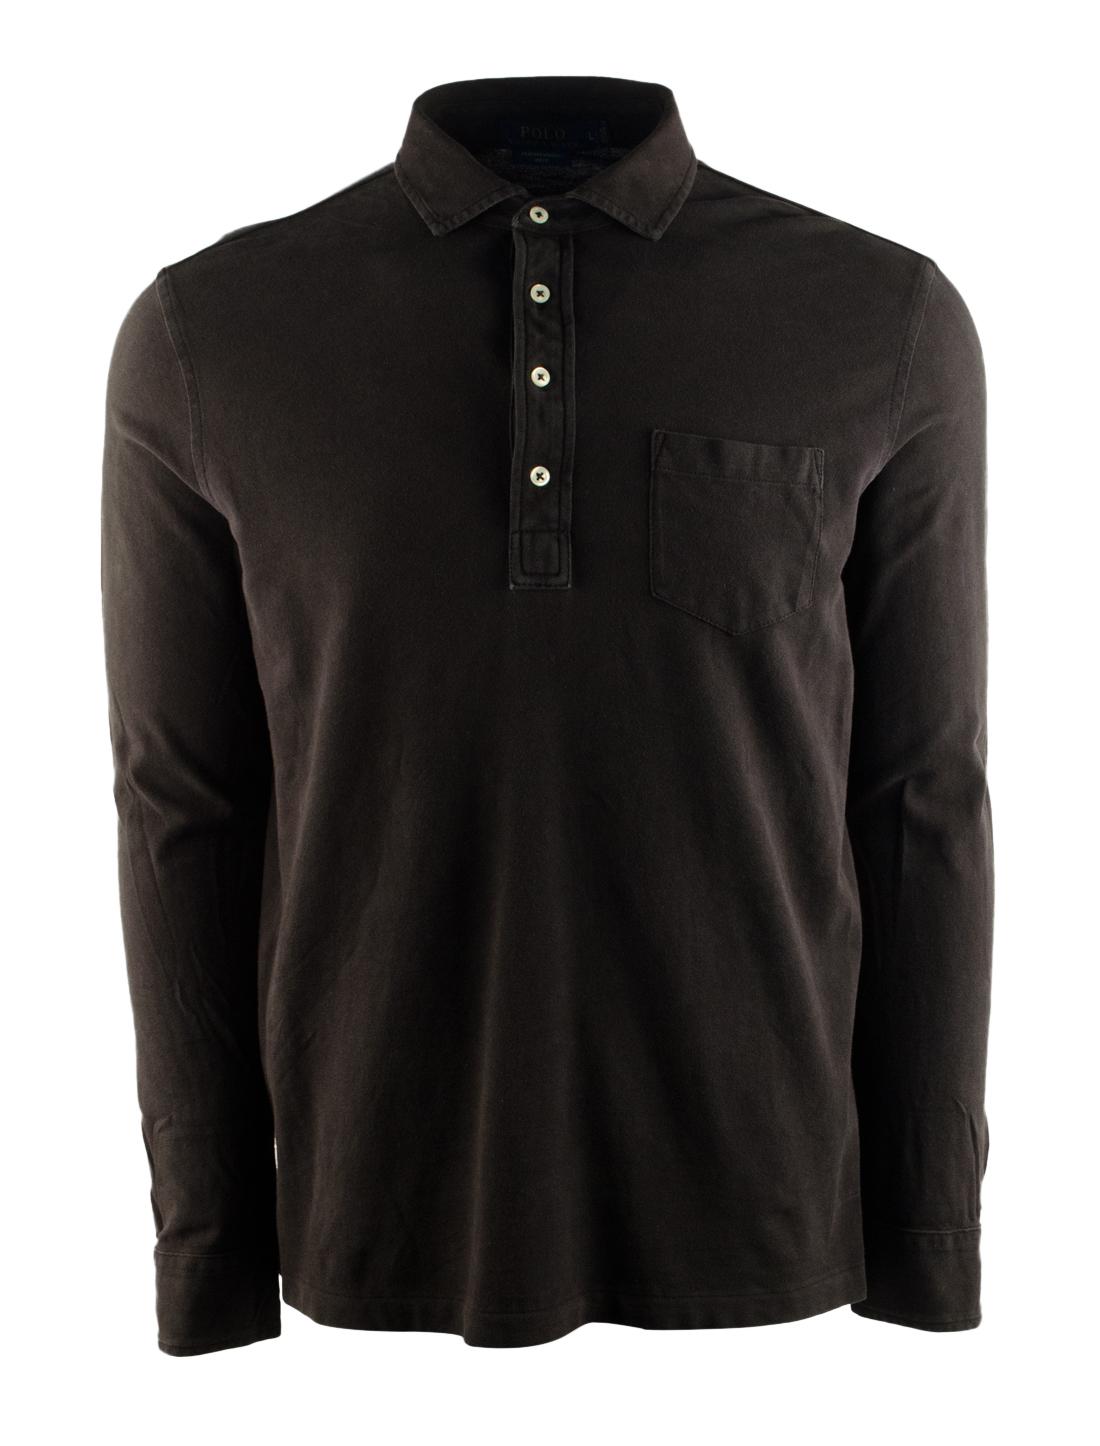 Mens Long Sleeve Polo Shirt With Pocket